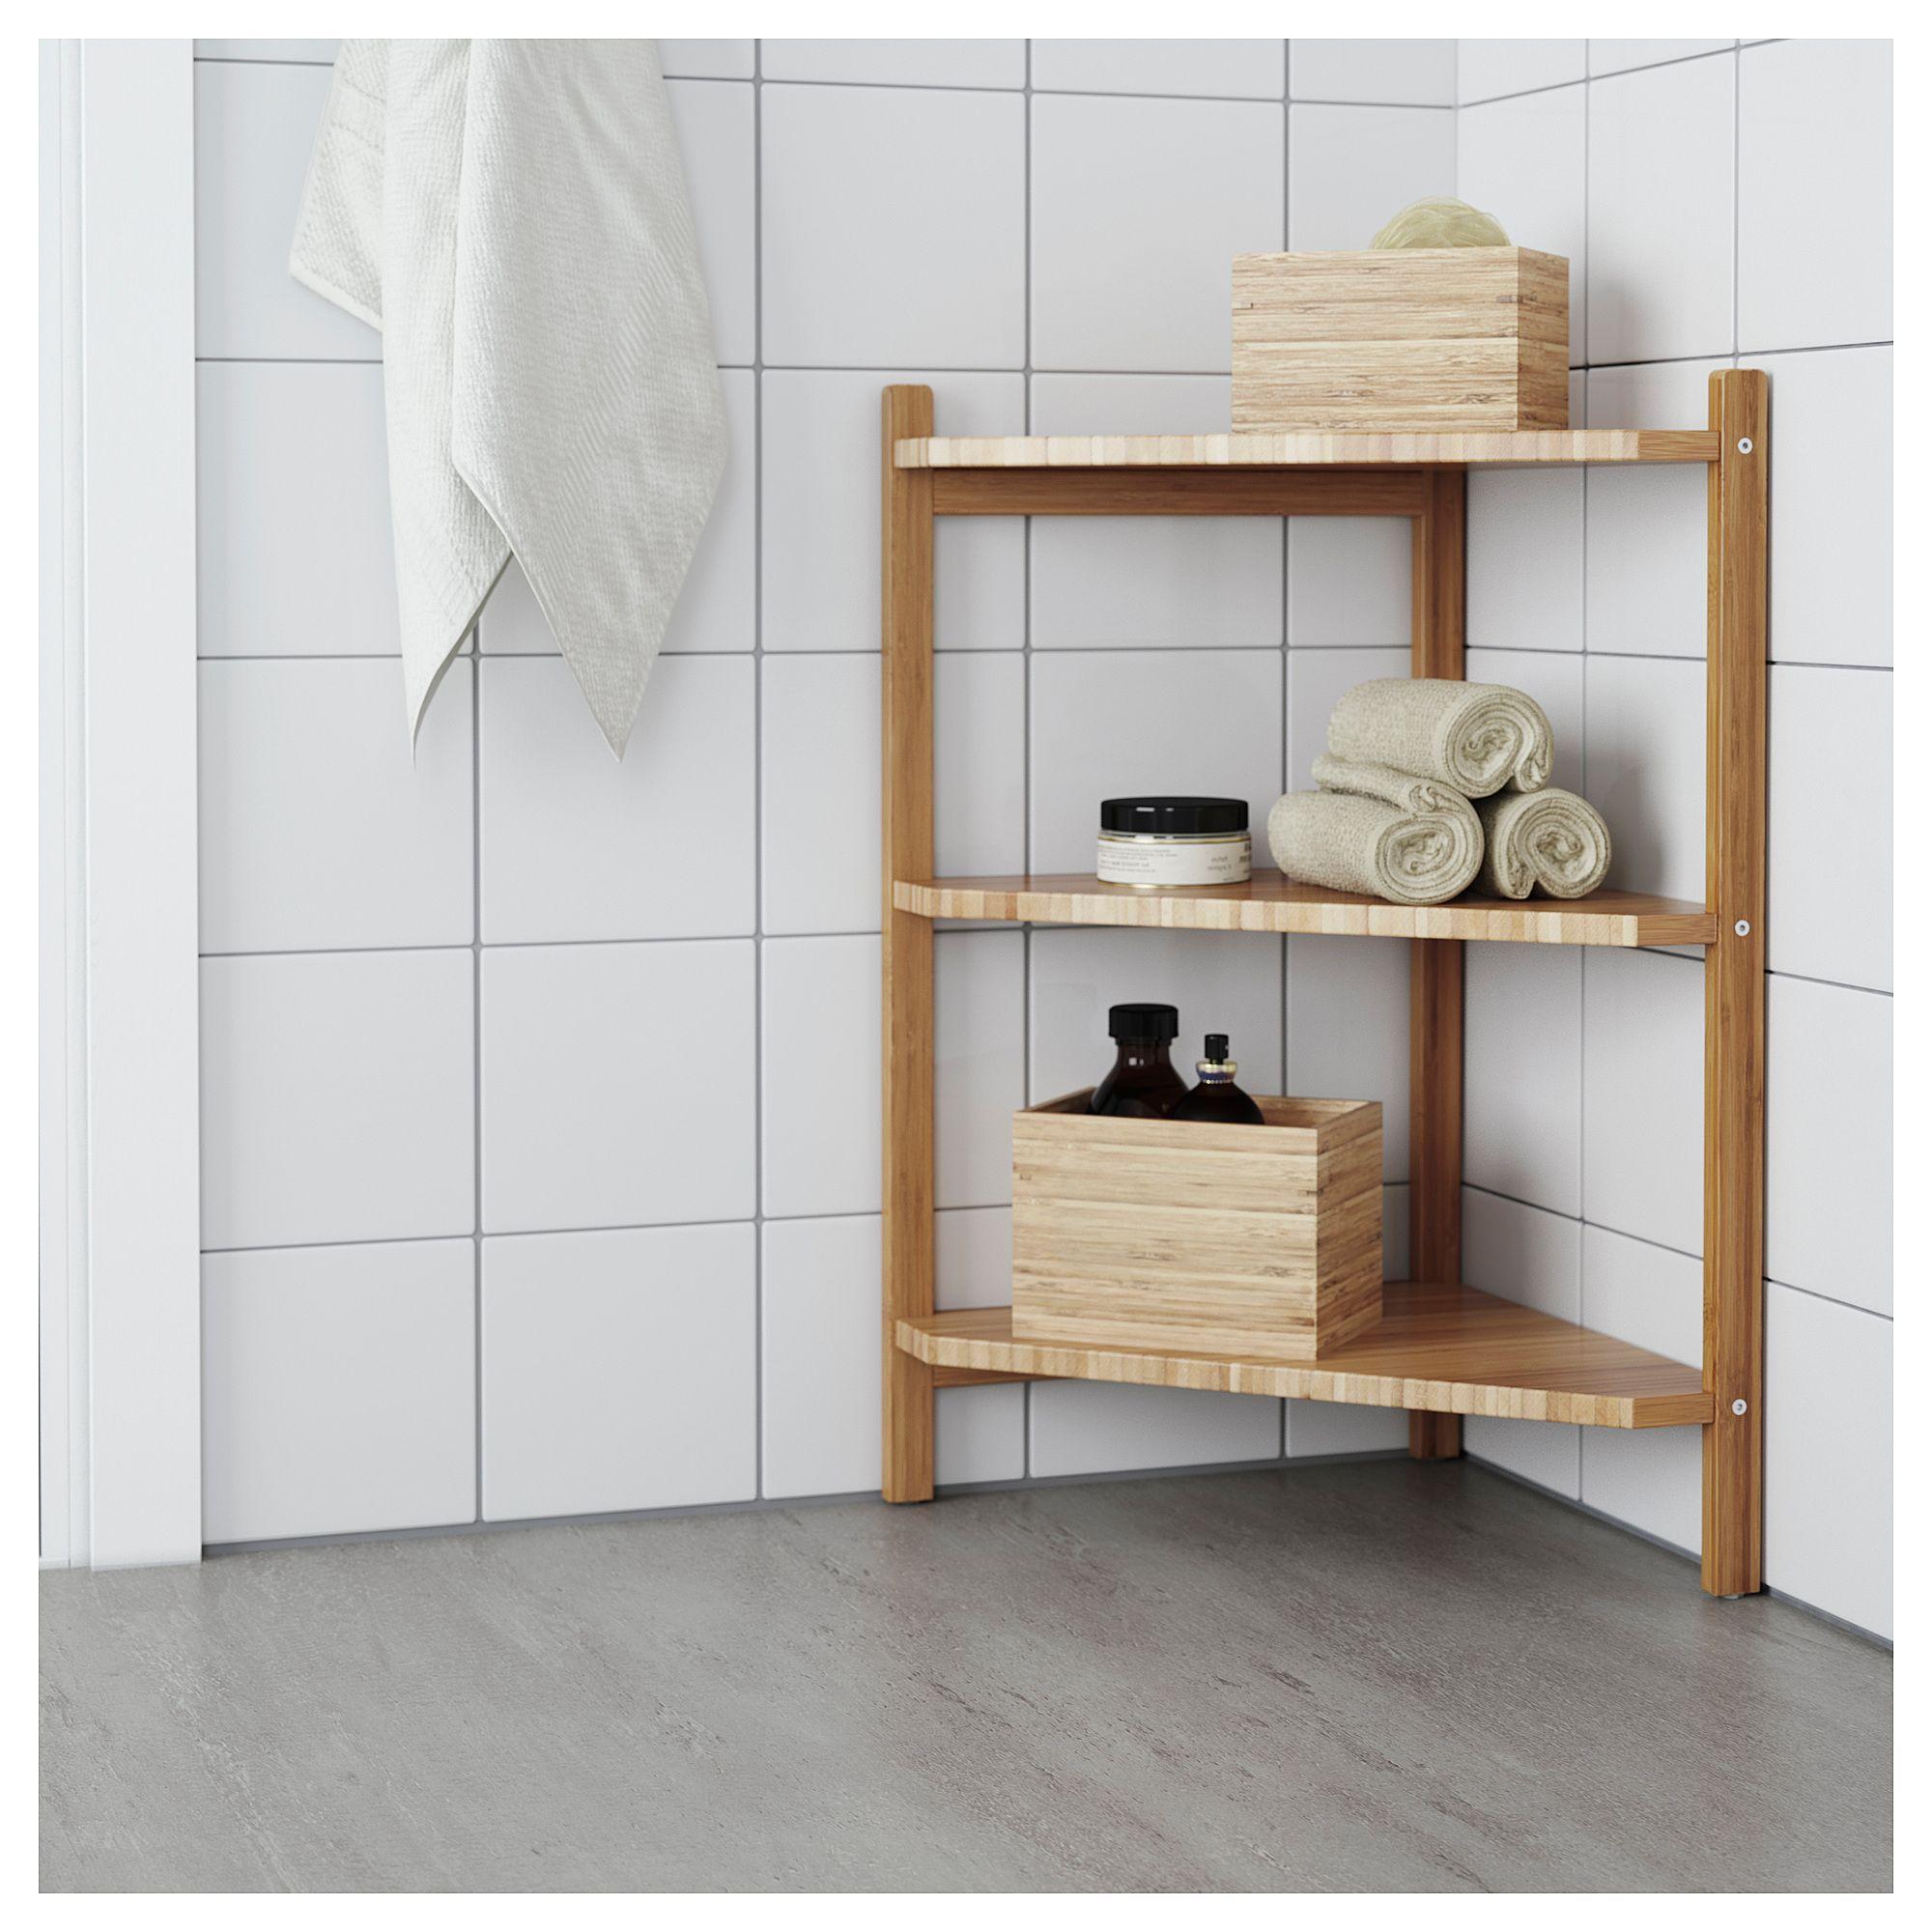 Ikea  R Grund Sink Shelfcorner Shelf Bamboo